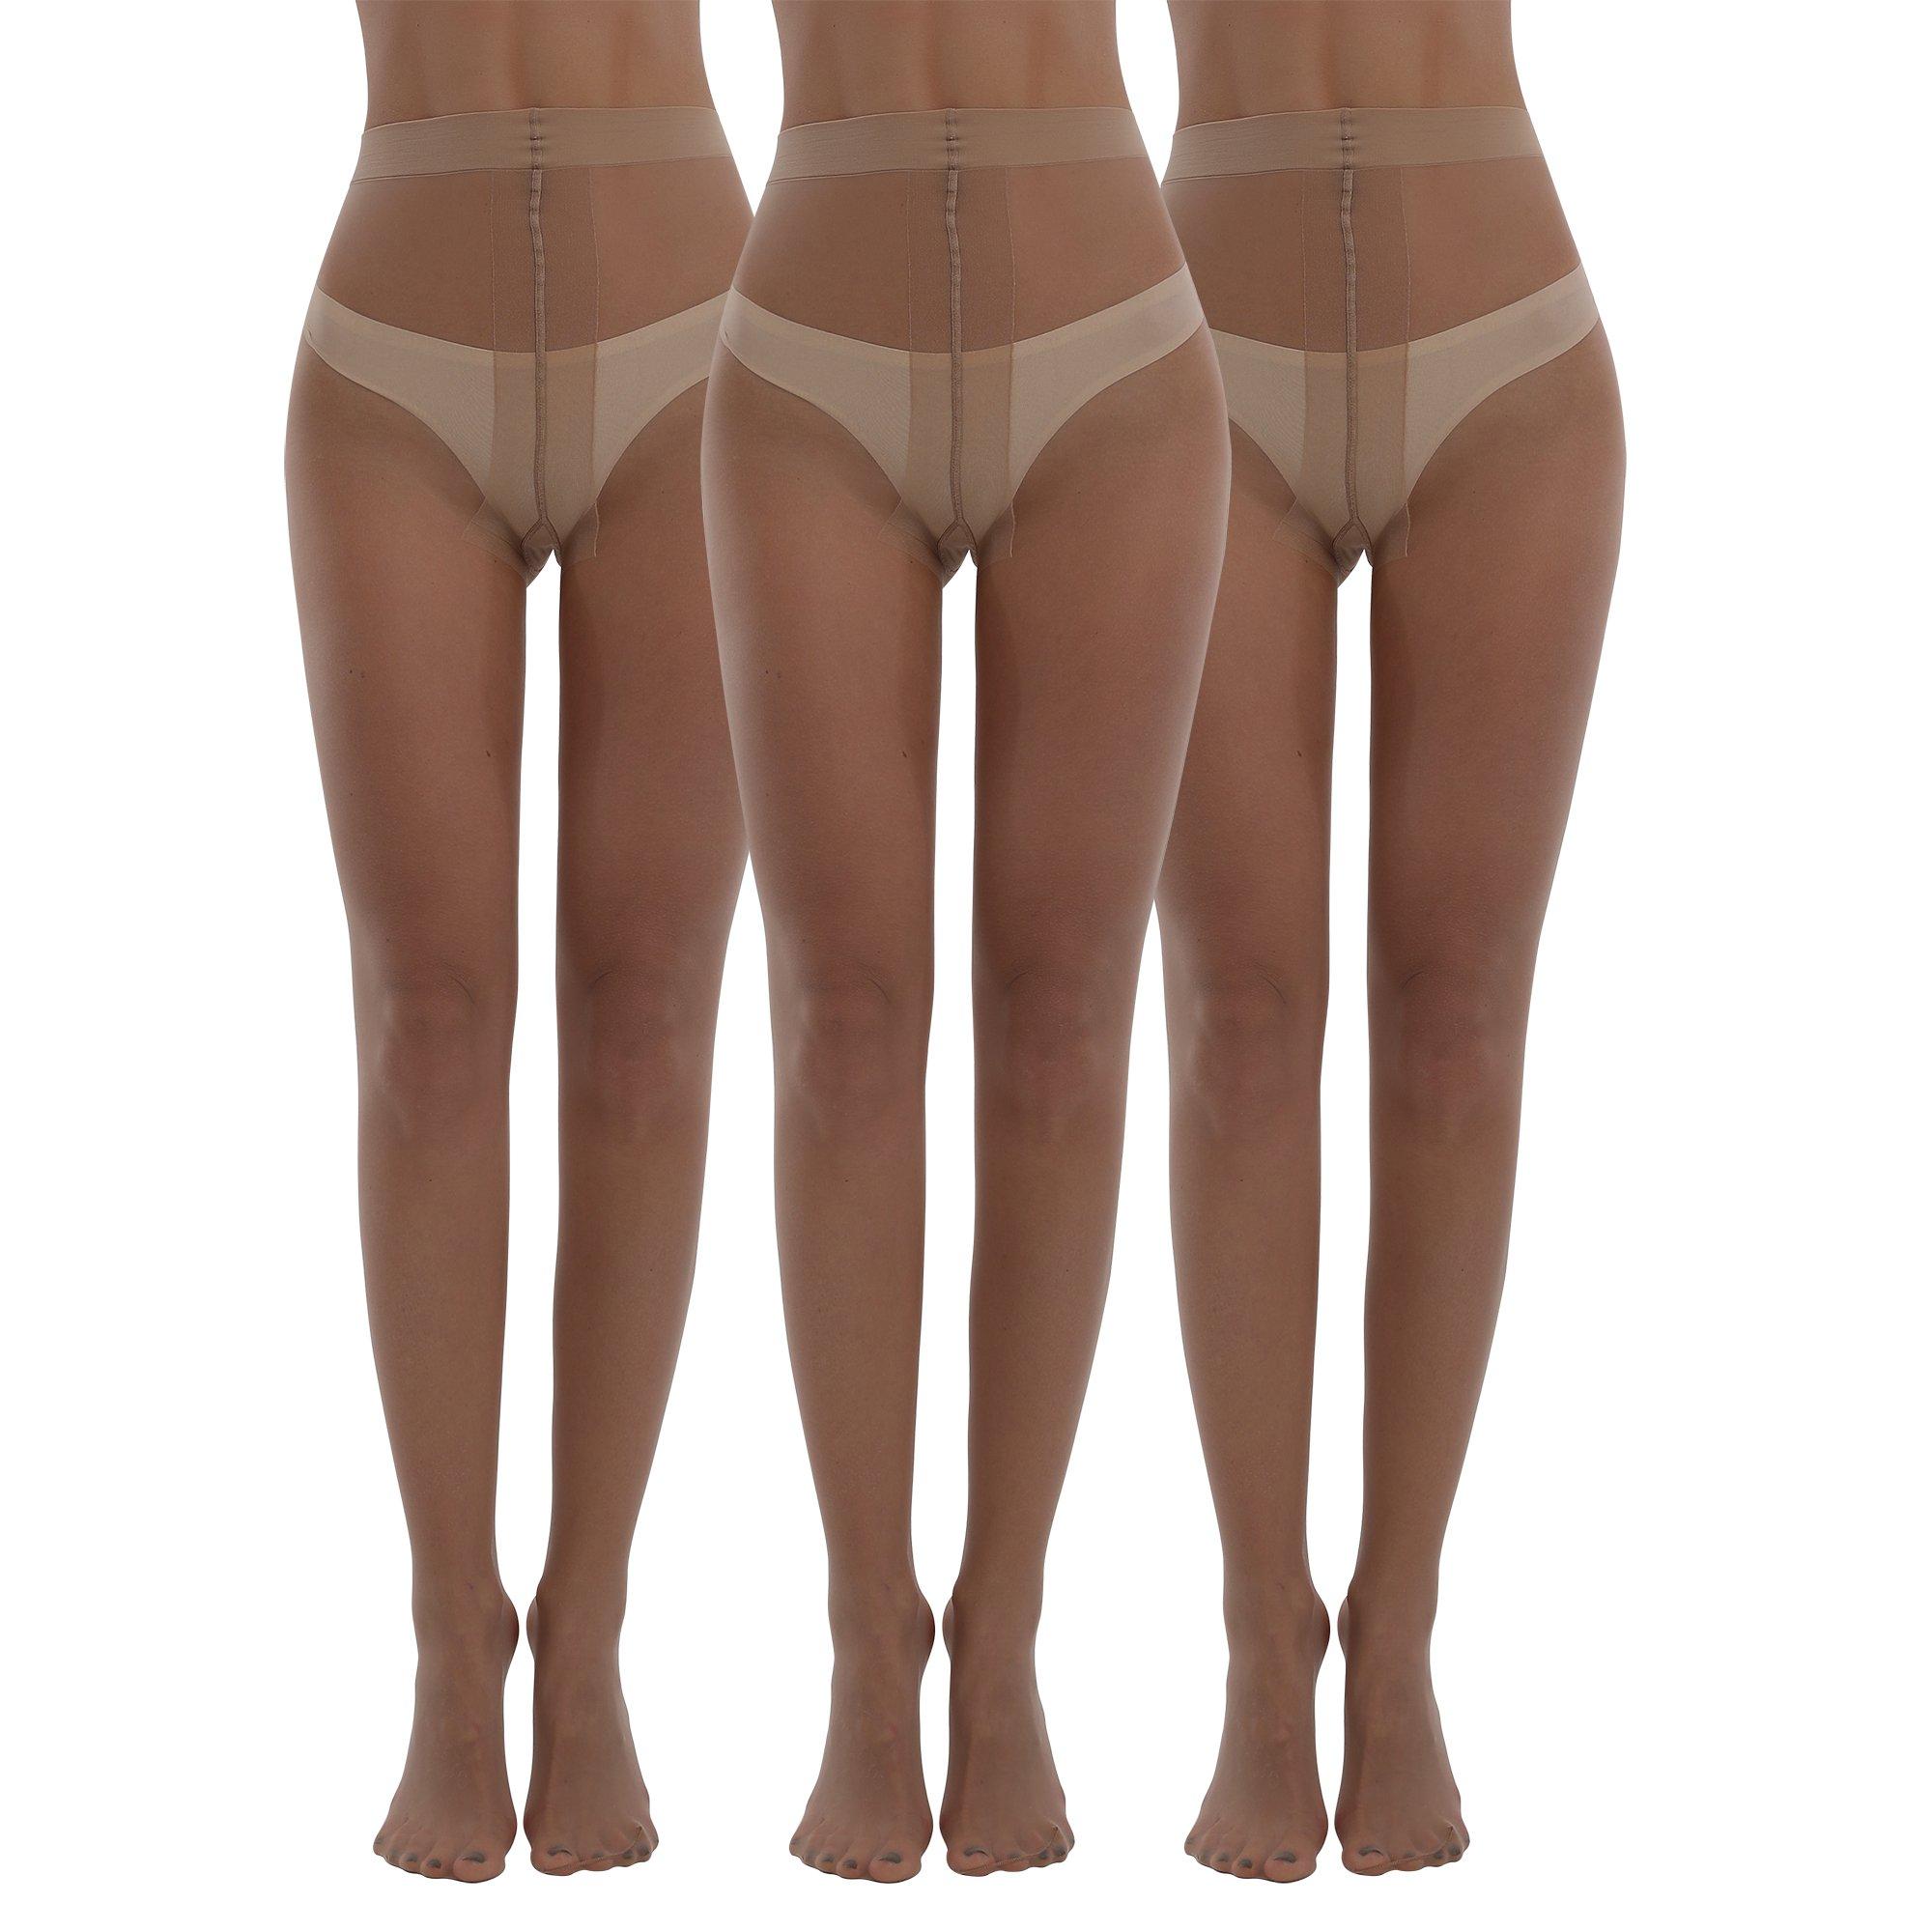 Womens Tights 3packs Denier Crotch